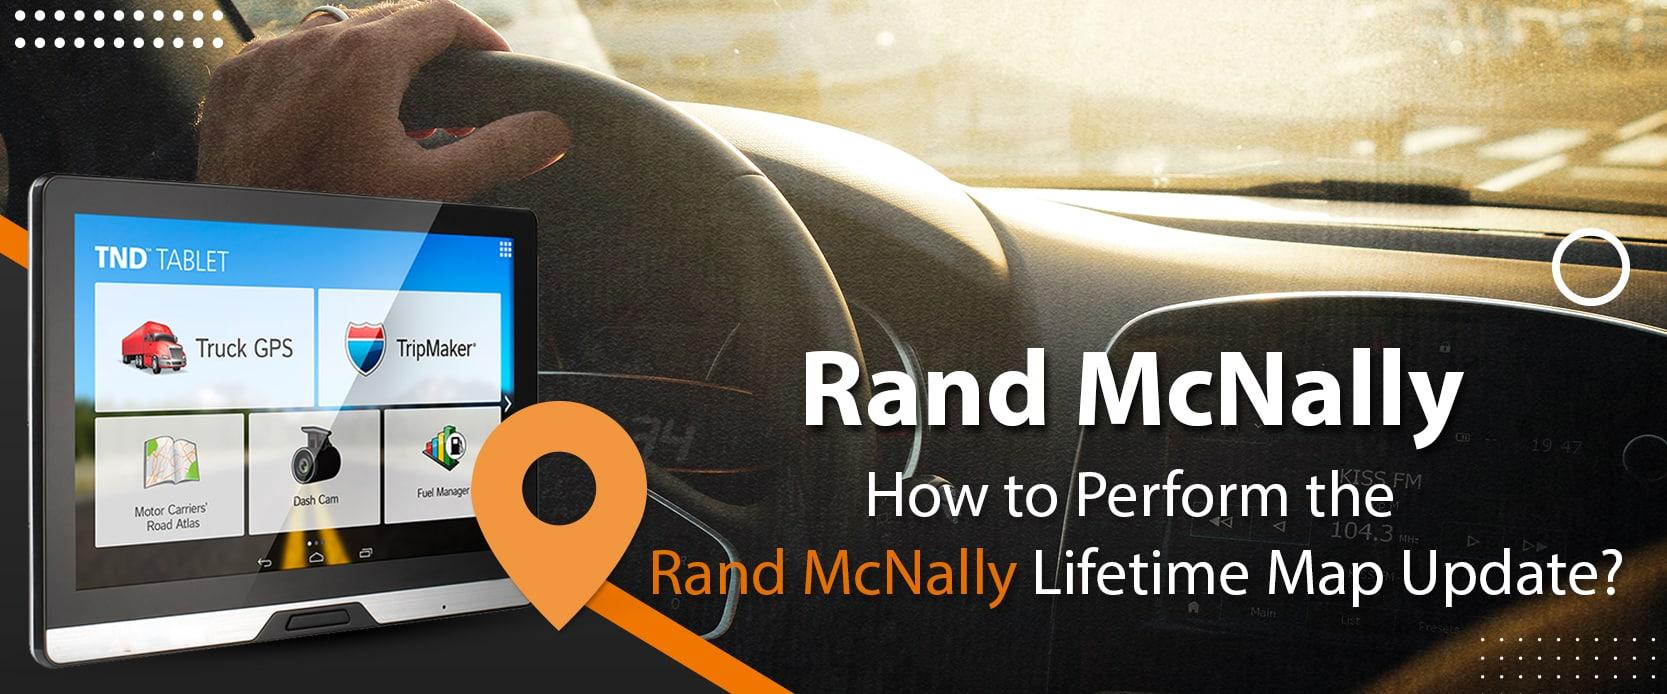 Blogs - Rand McNally Dock Update